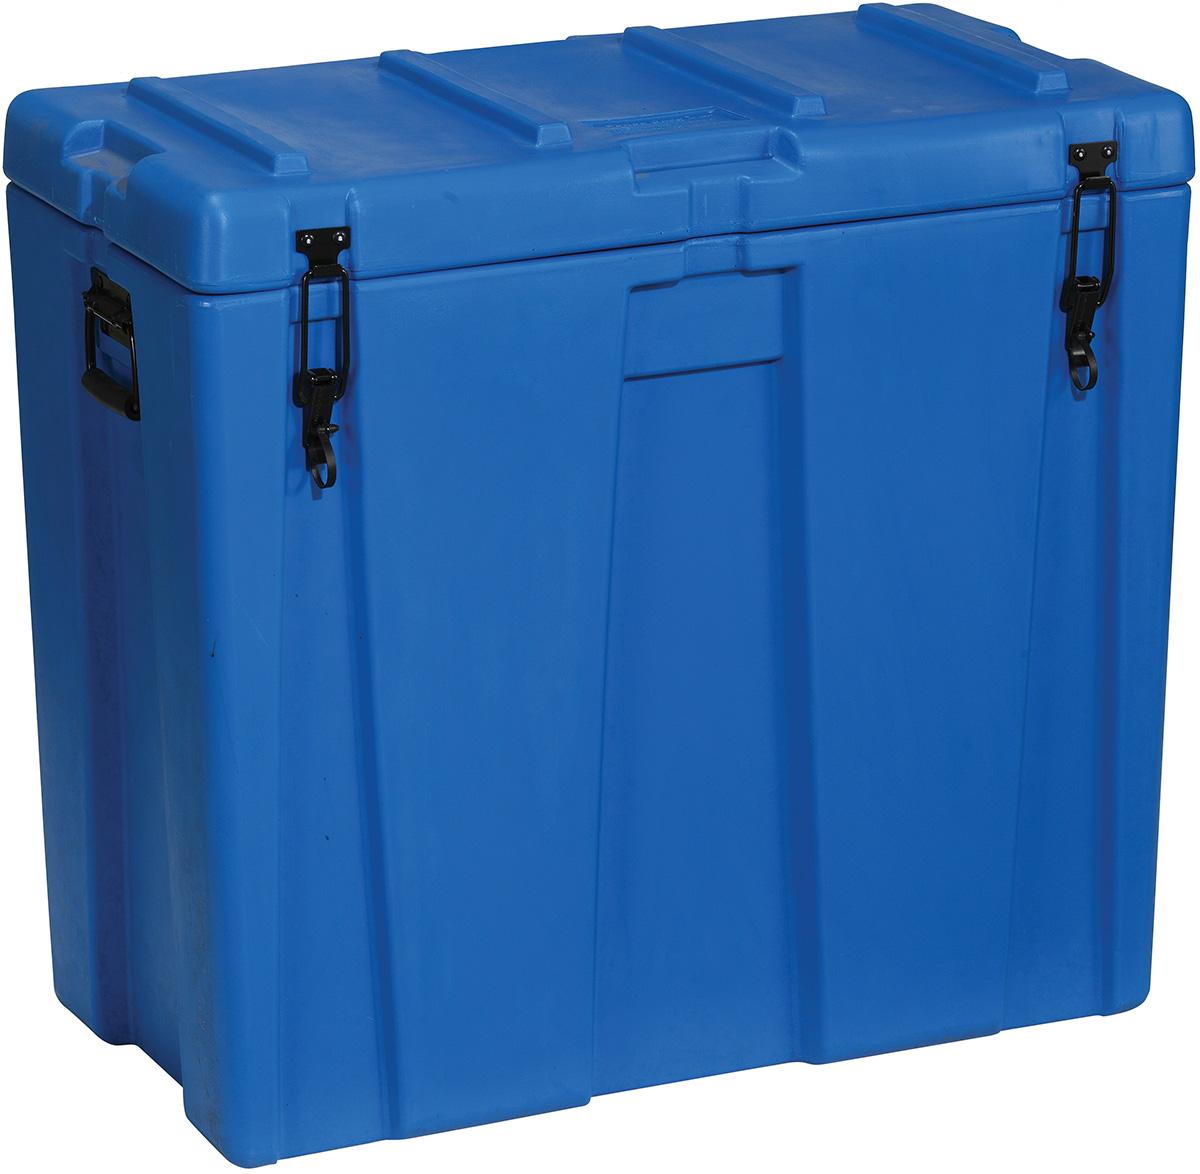 pelican spacecase hard waterproof case